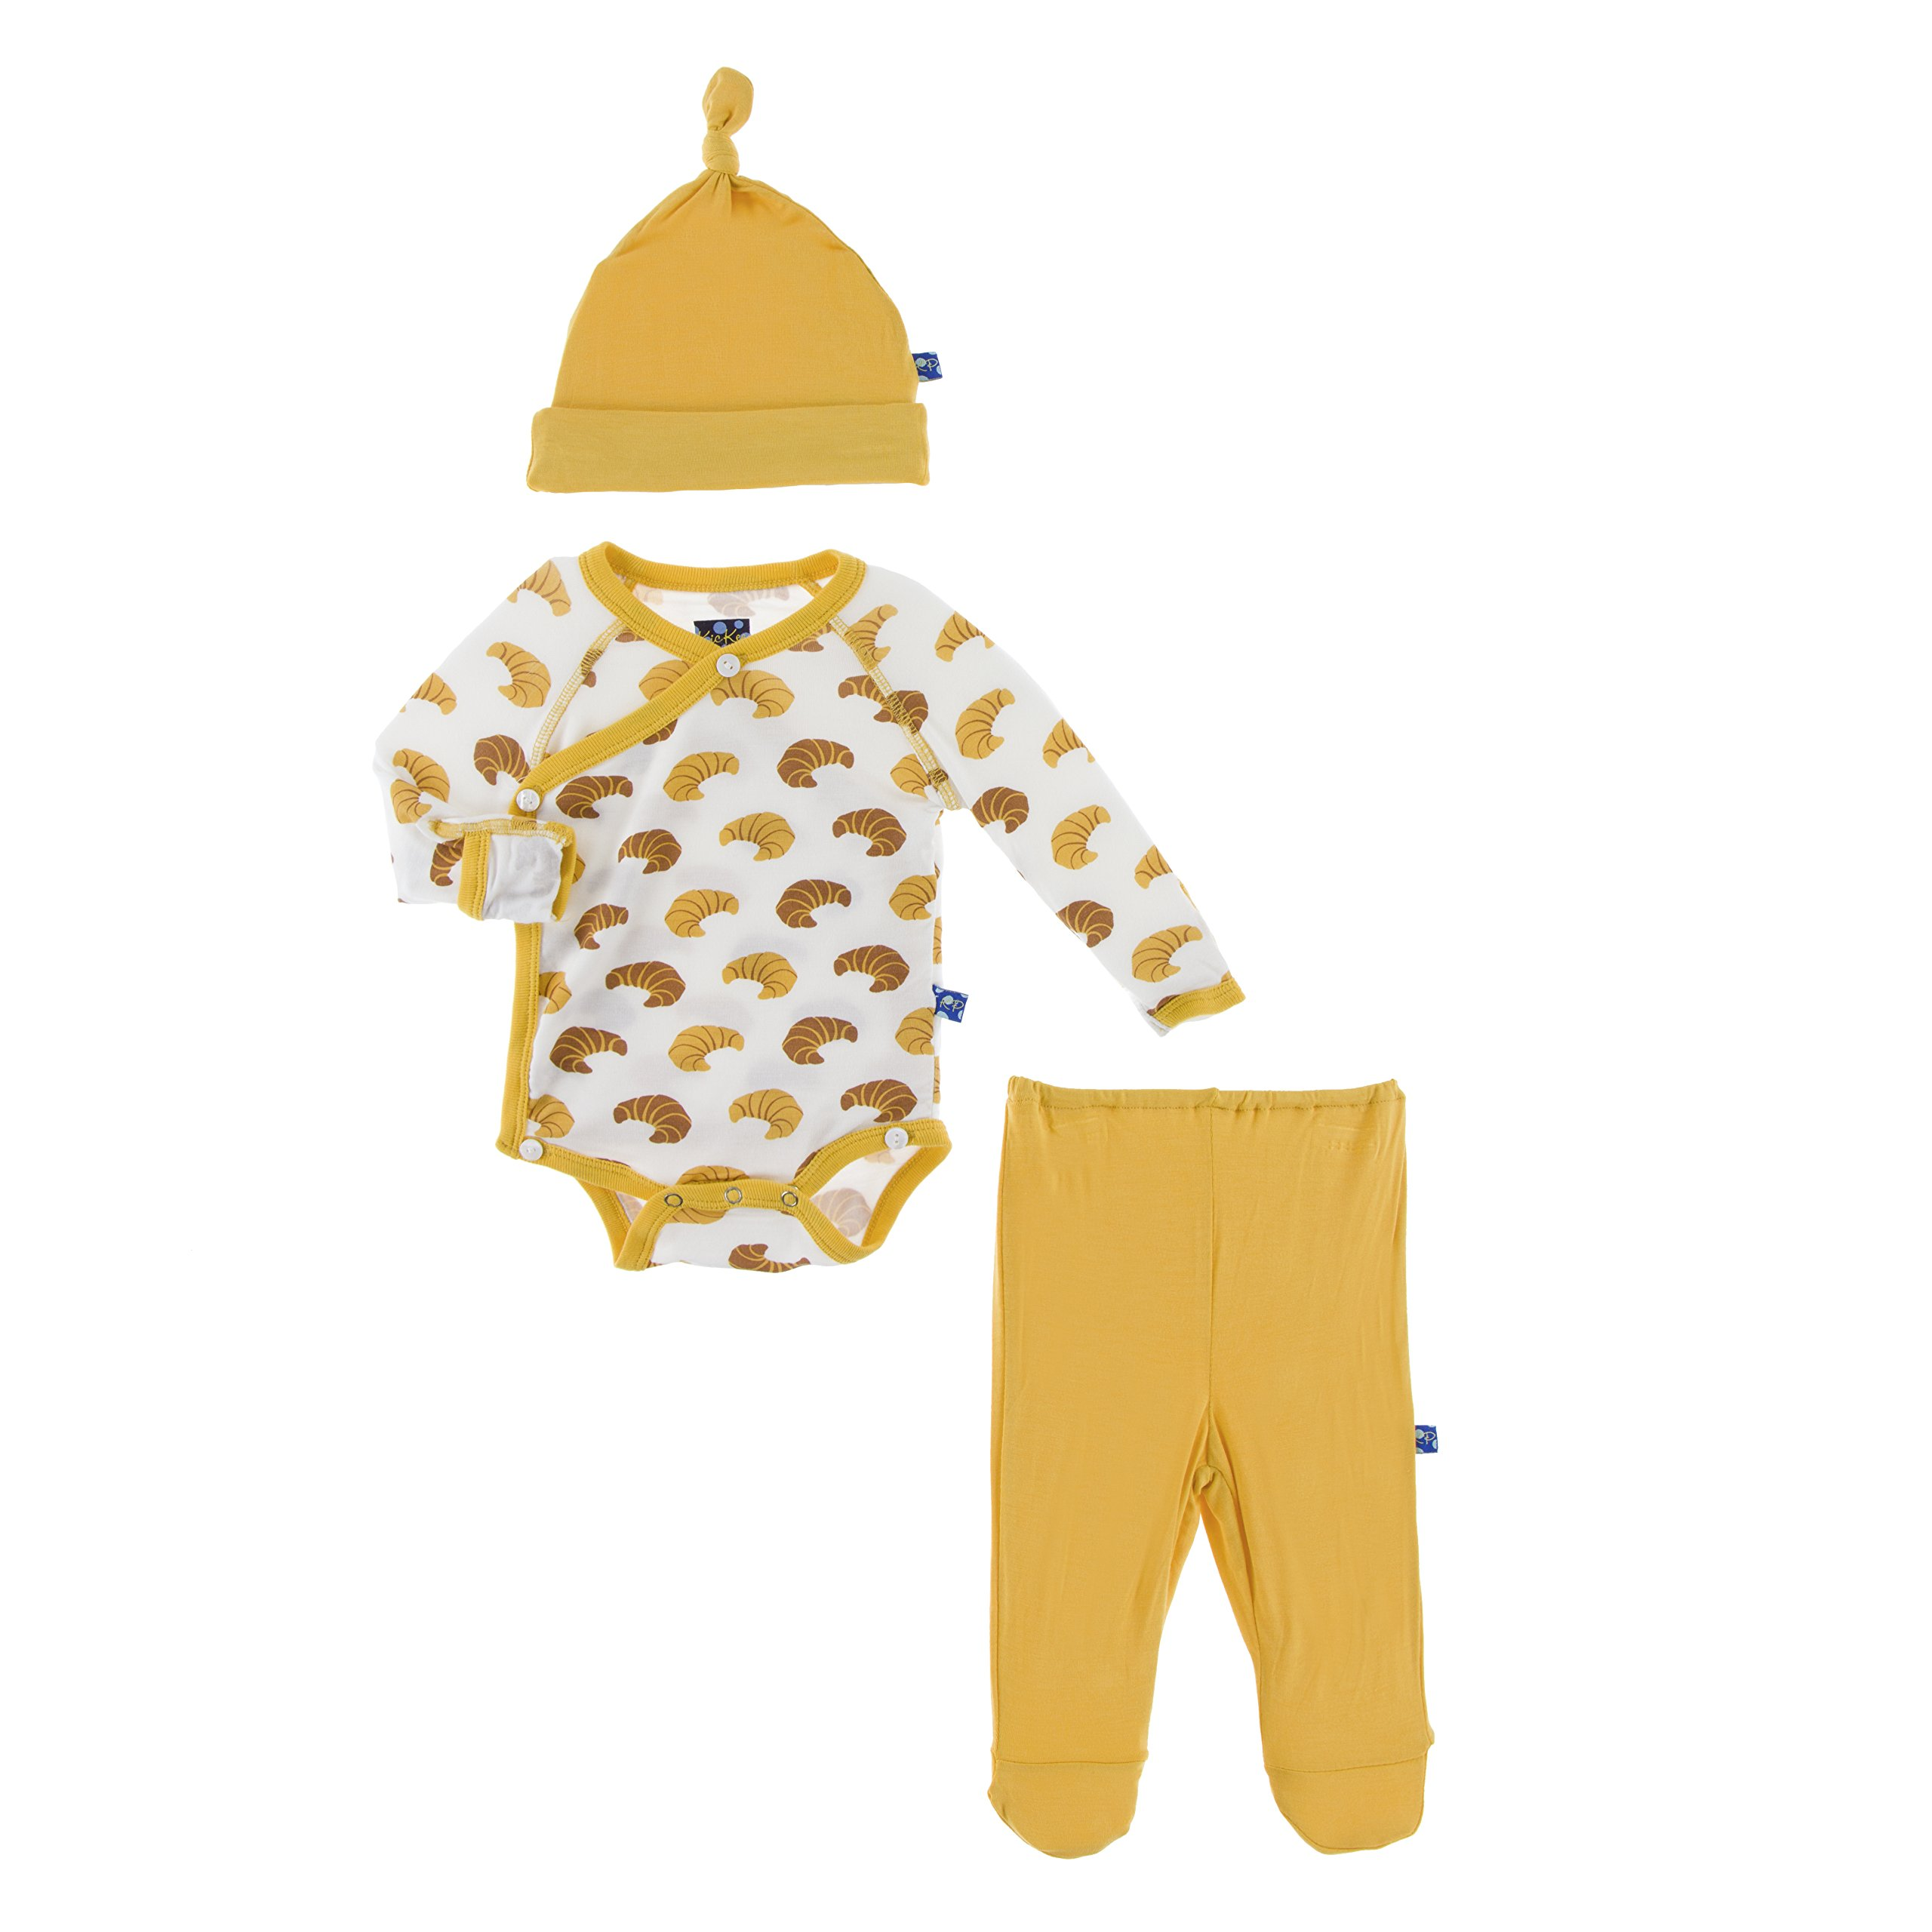 f1f9032cc729 KicKee Pants Little Boys Kimono Newborn Gift Set with Elephant Box -  Natural Cars and Trucks